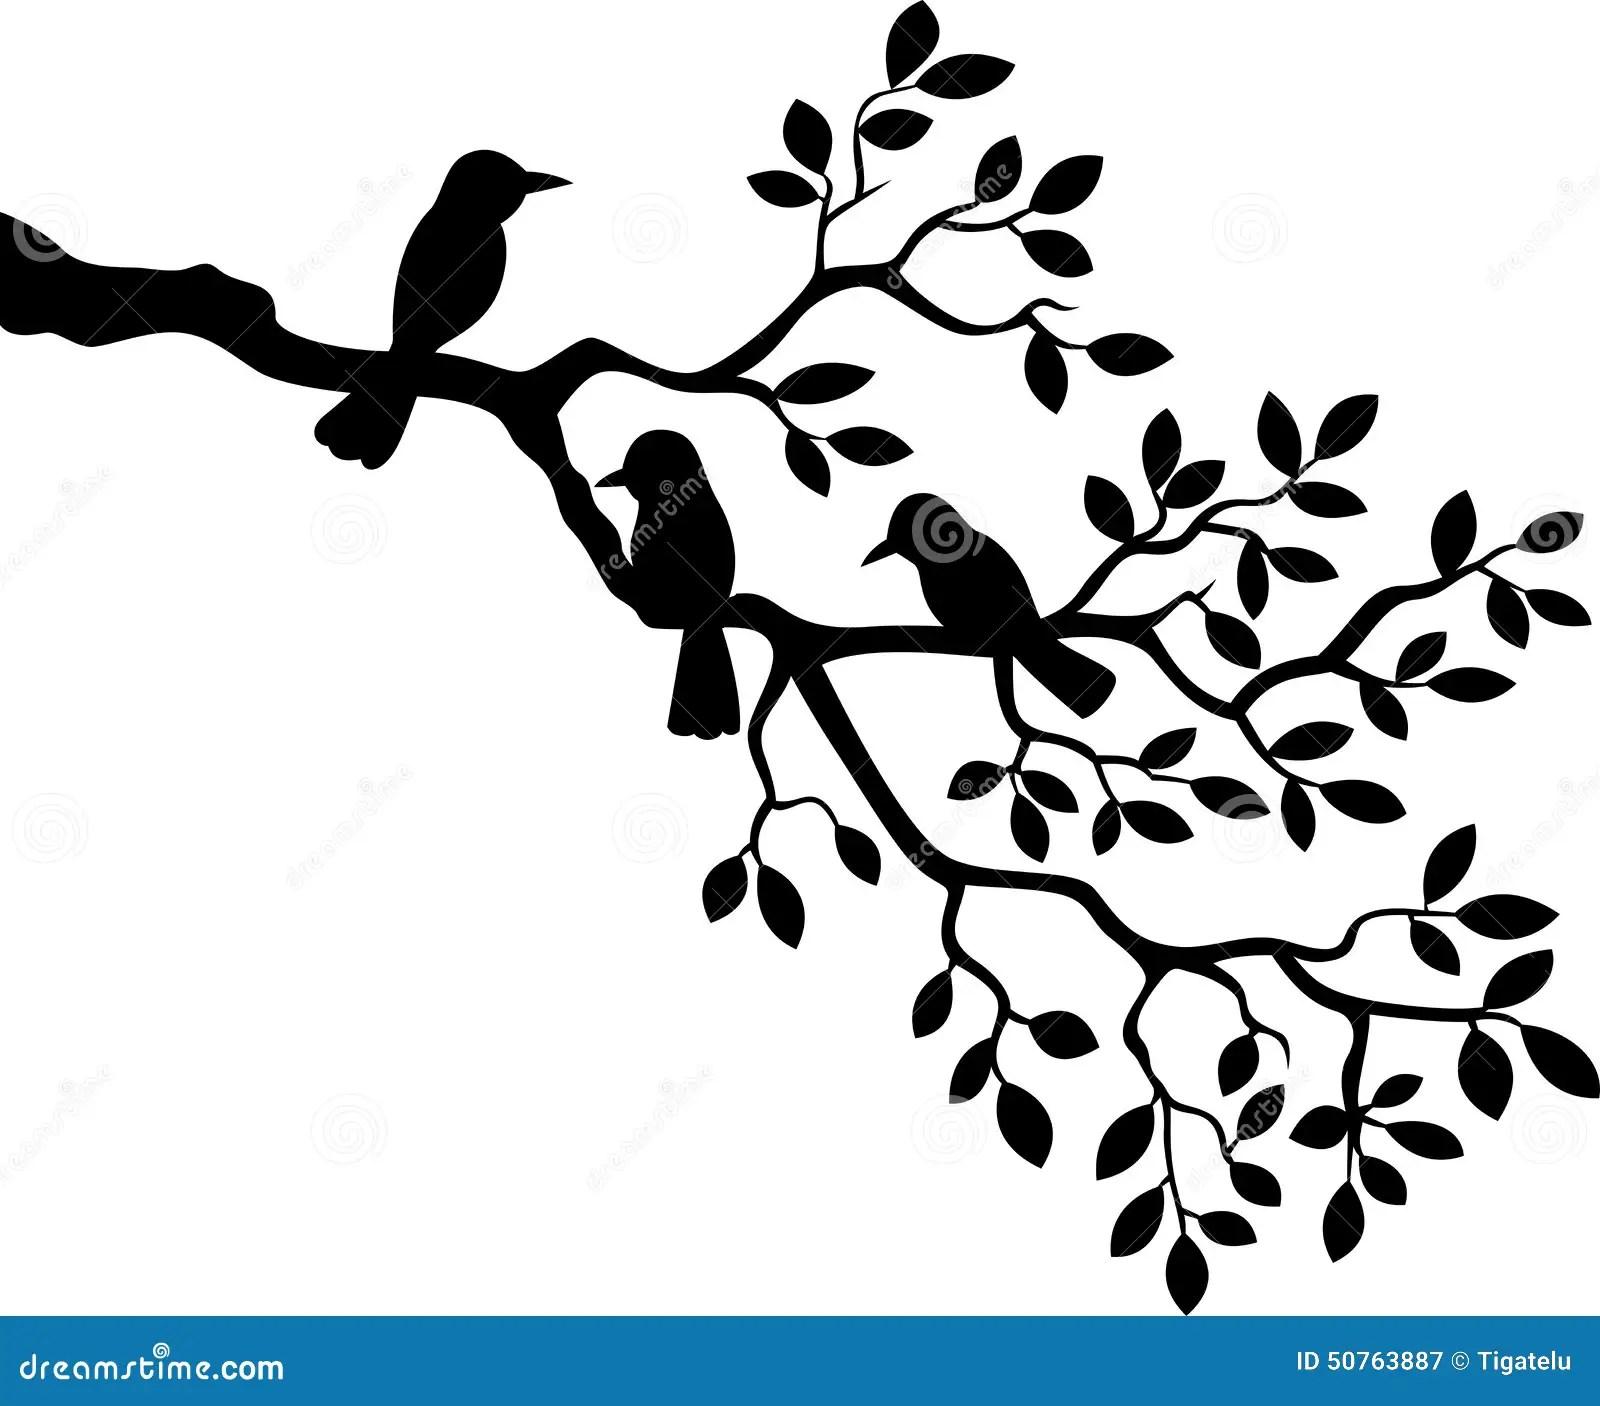 Cartoon Tree Branch With Bird Silhouette Stock Vector